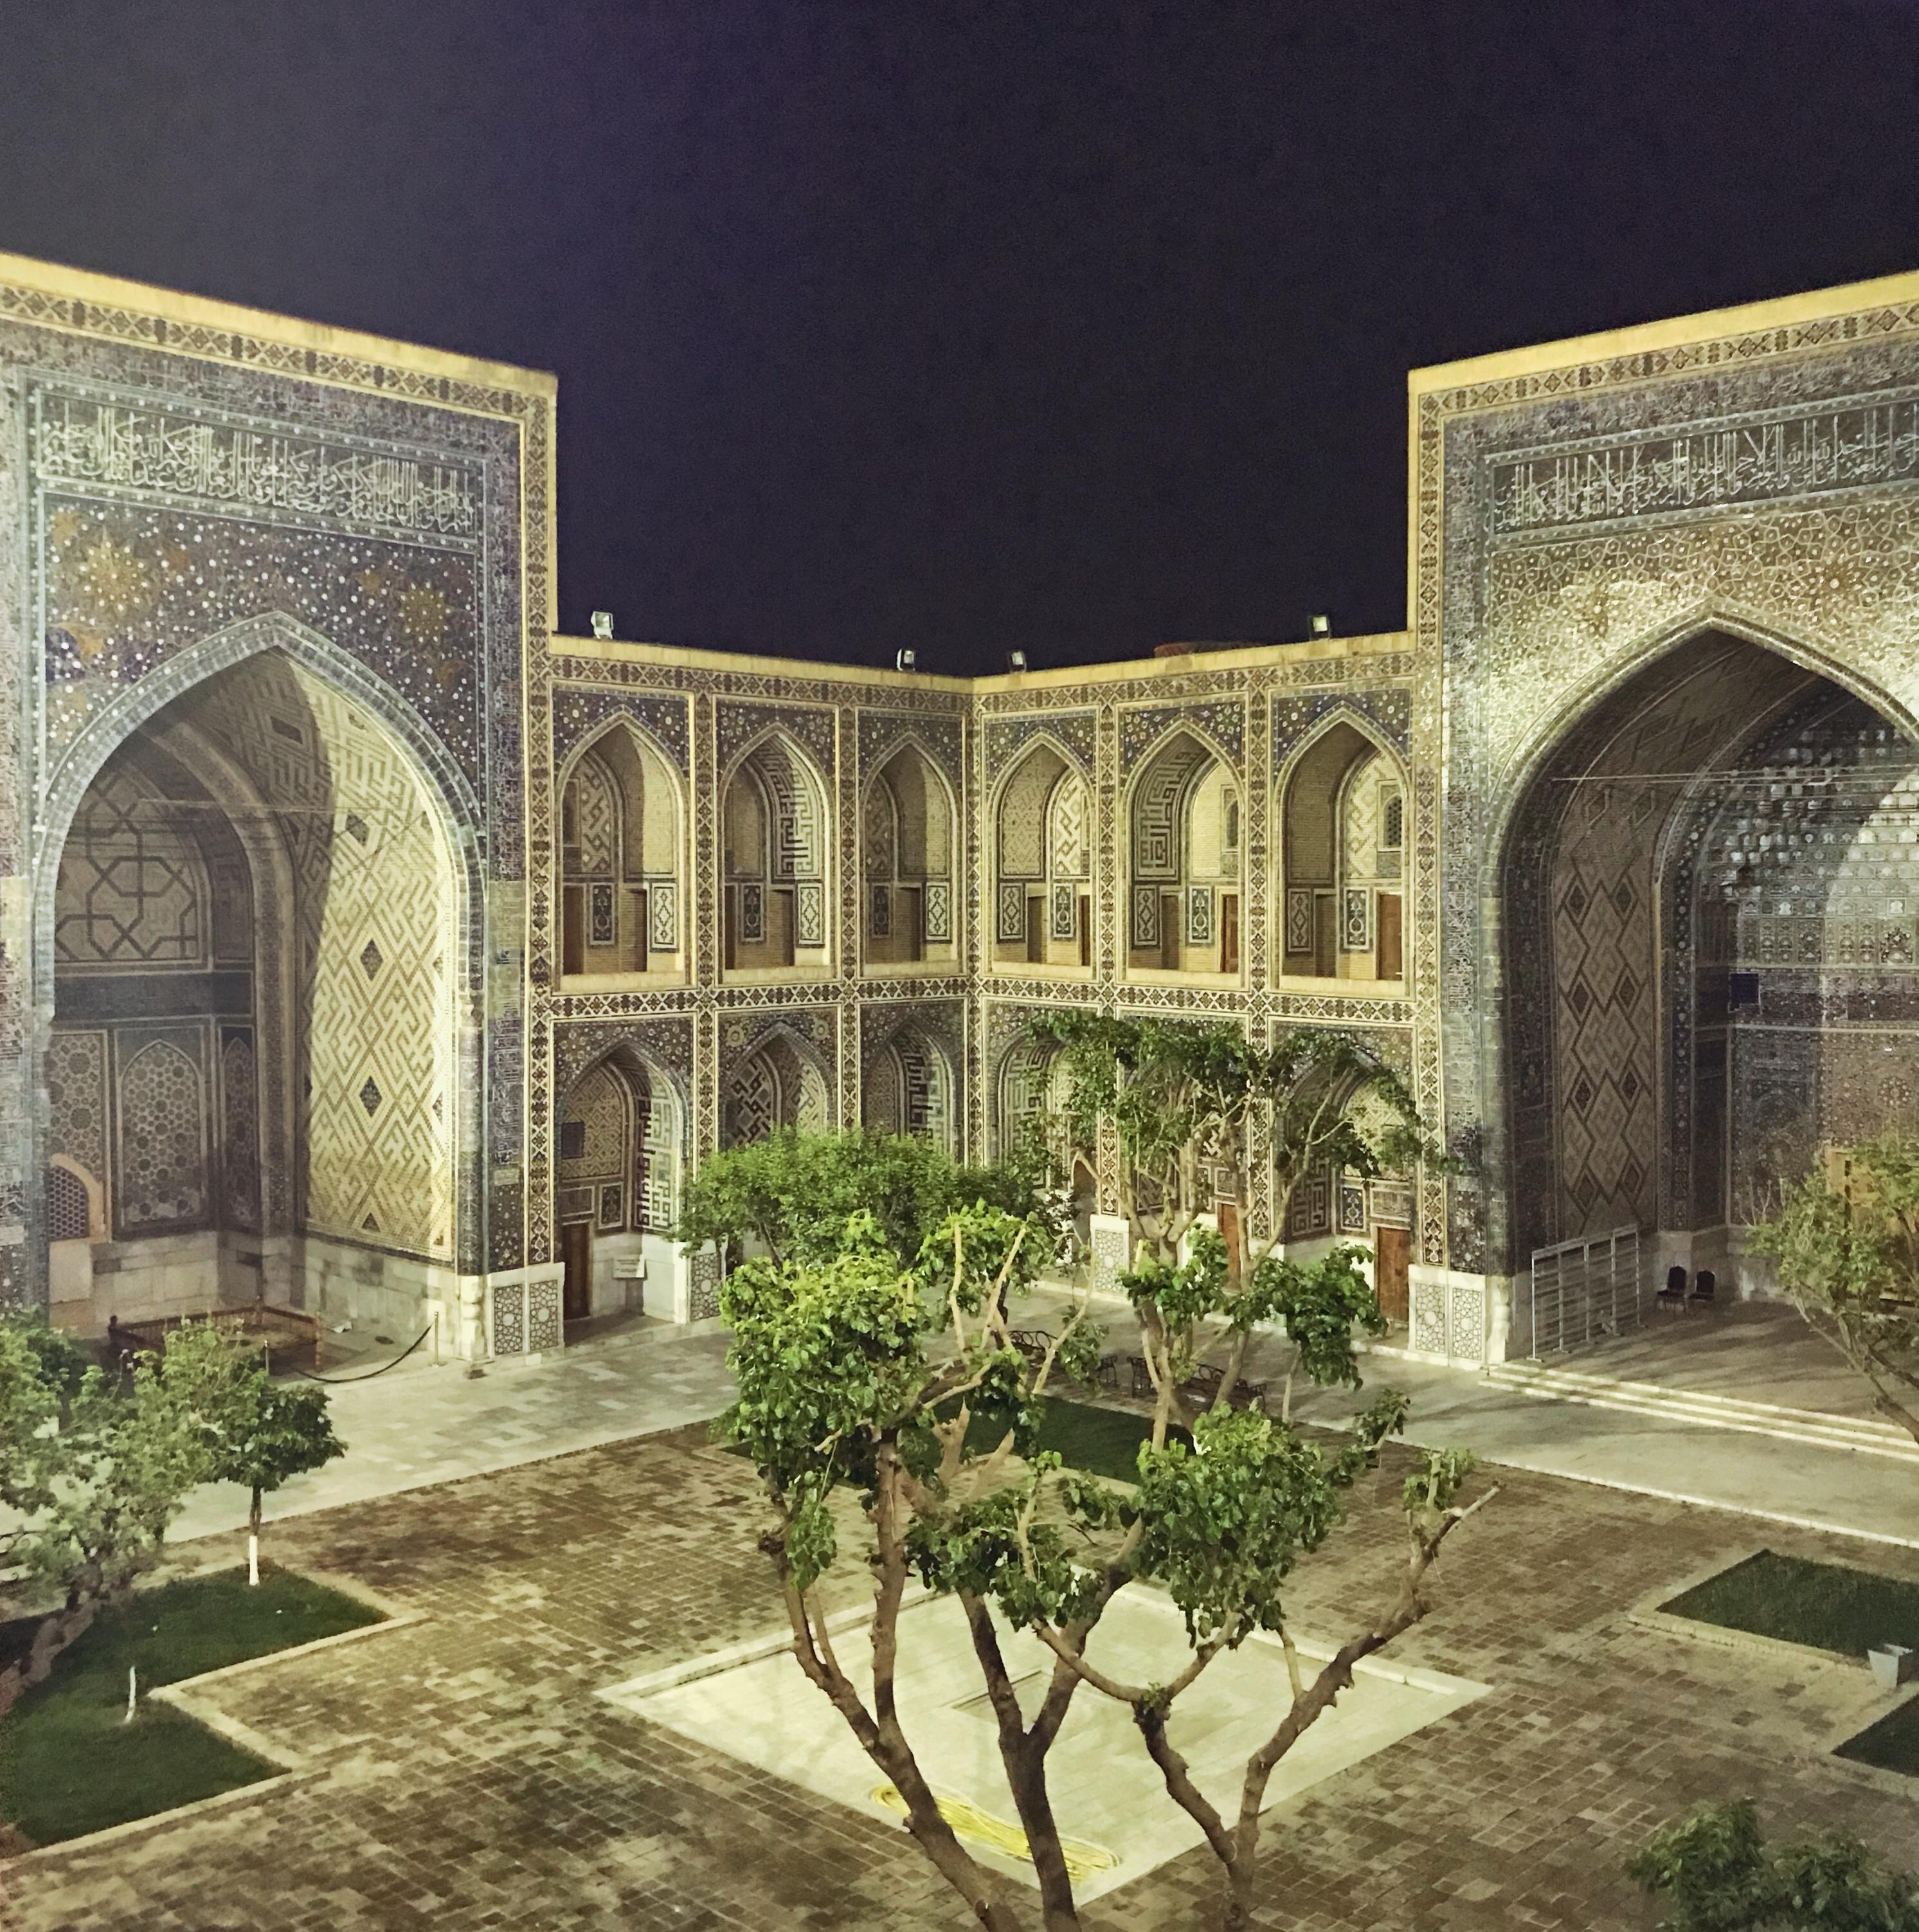 Usbekistan Samarkand kscheib Ulugbek-Madrasa